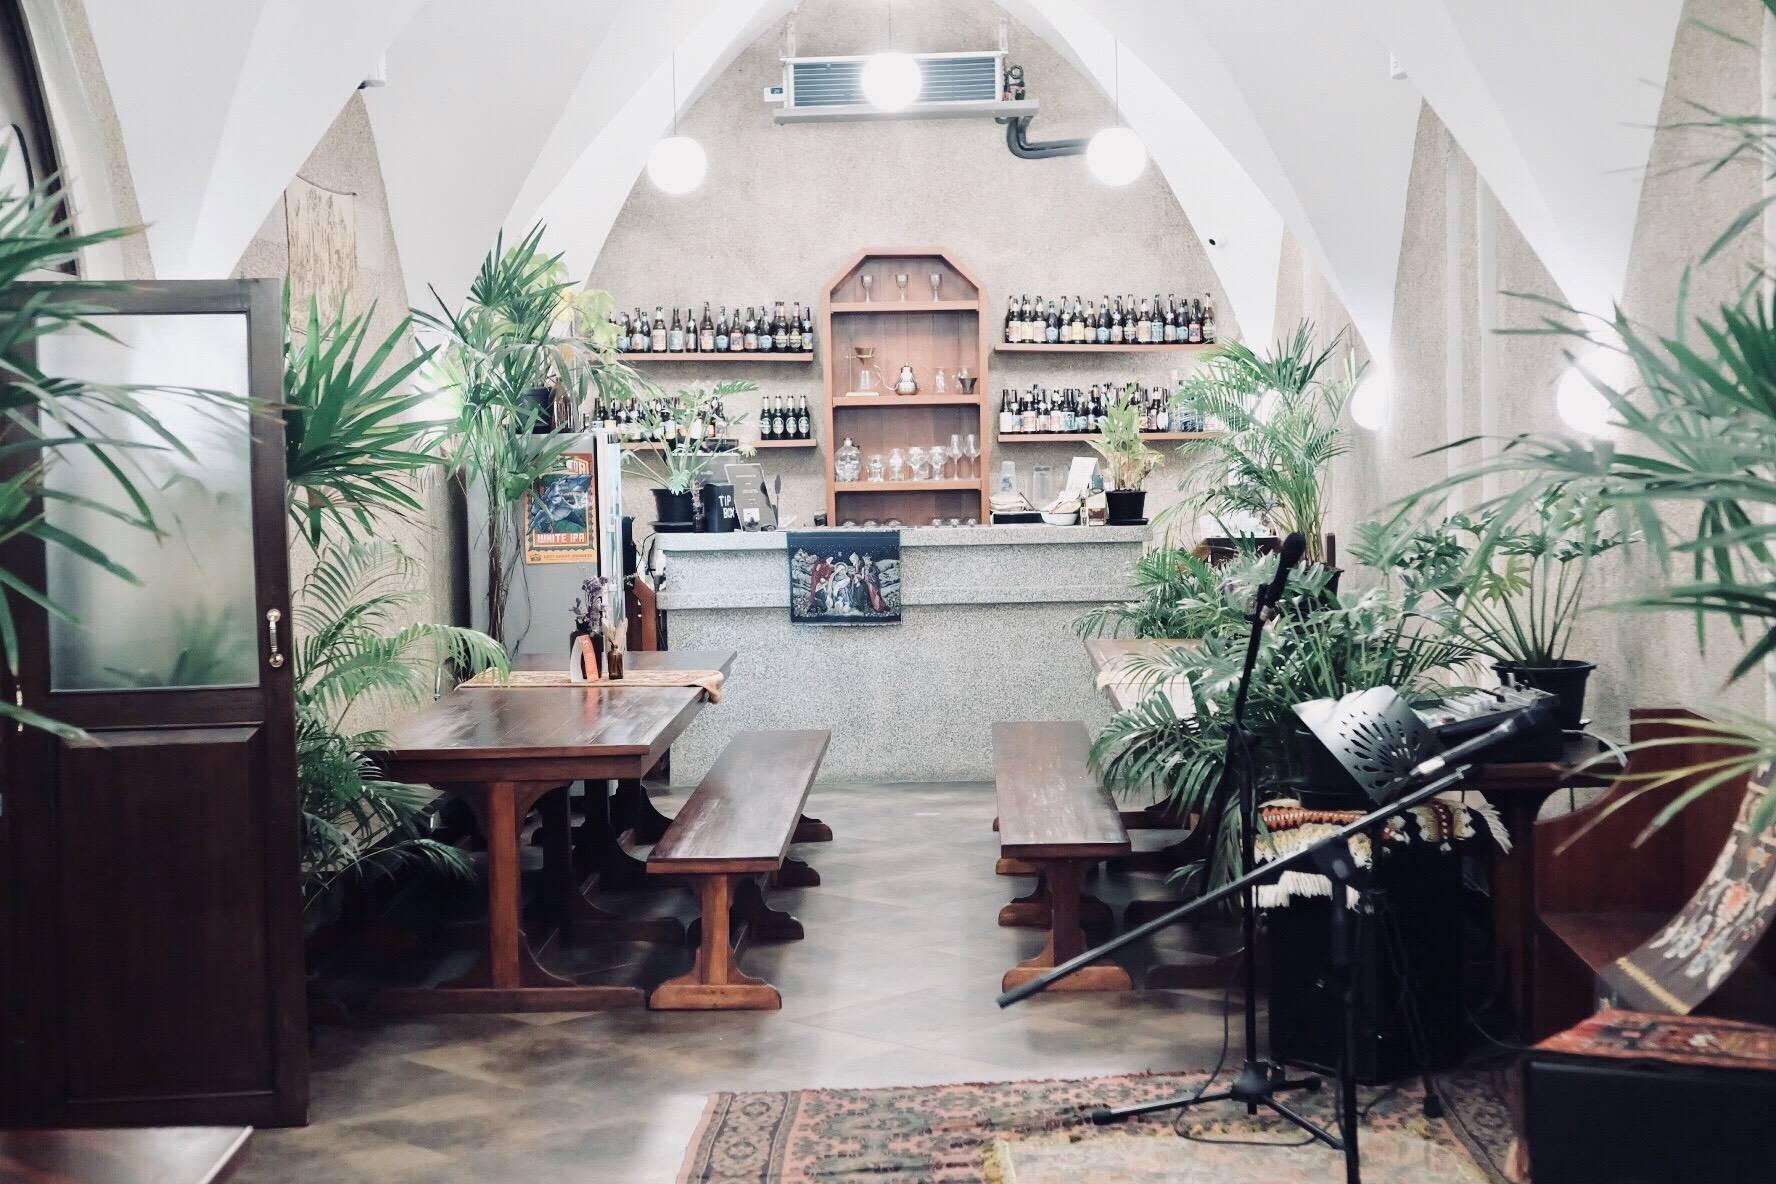 The Laboratory & Across The Universe Restaurant